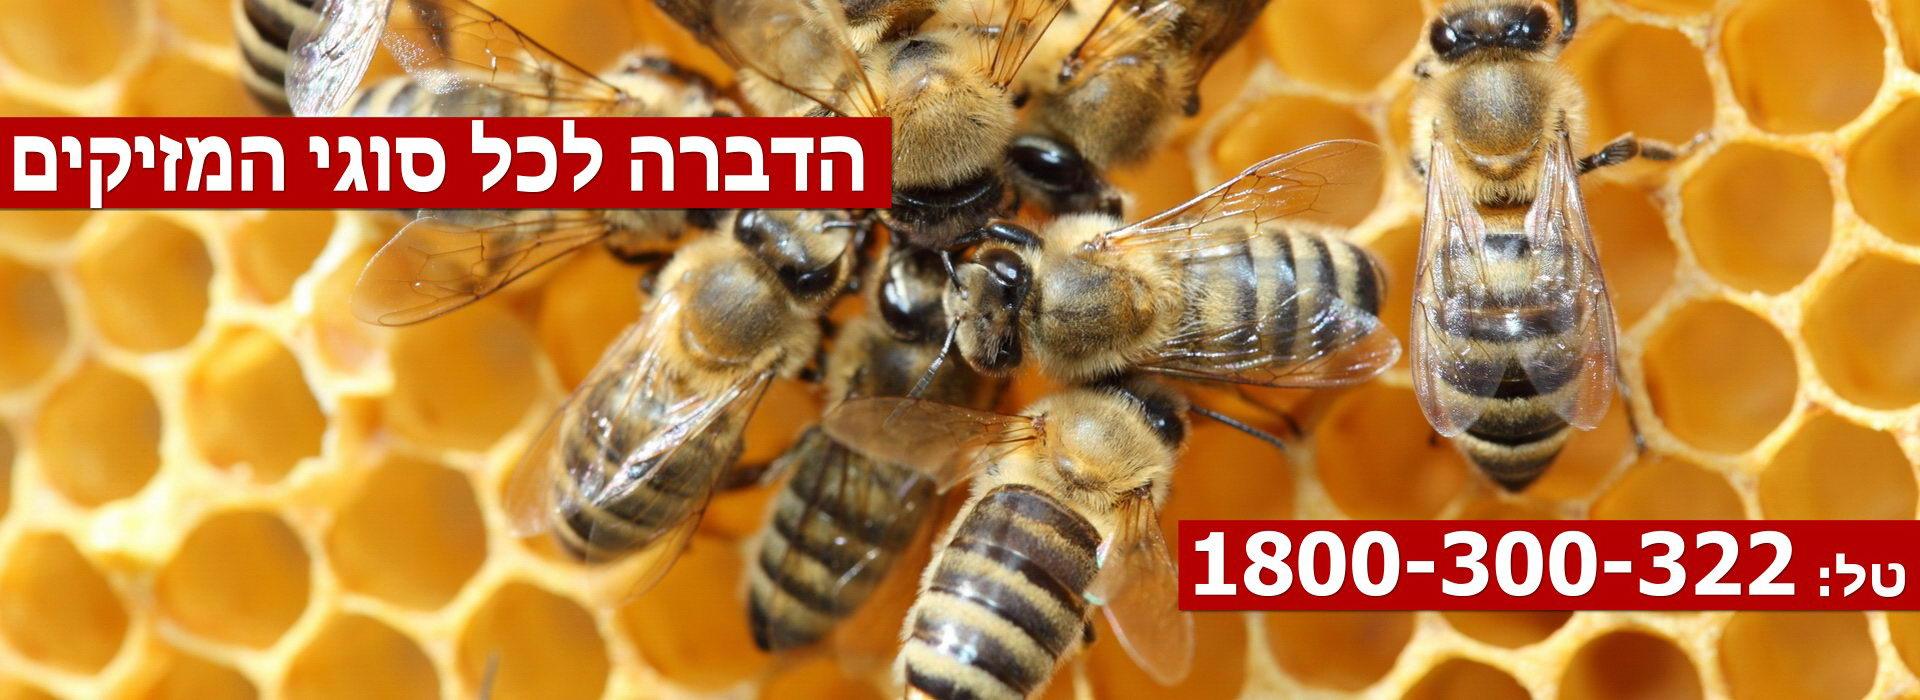 Pest-Control-Haifa-Slider1